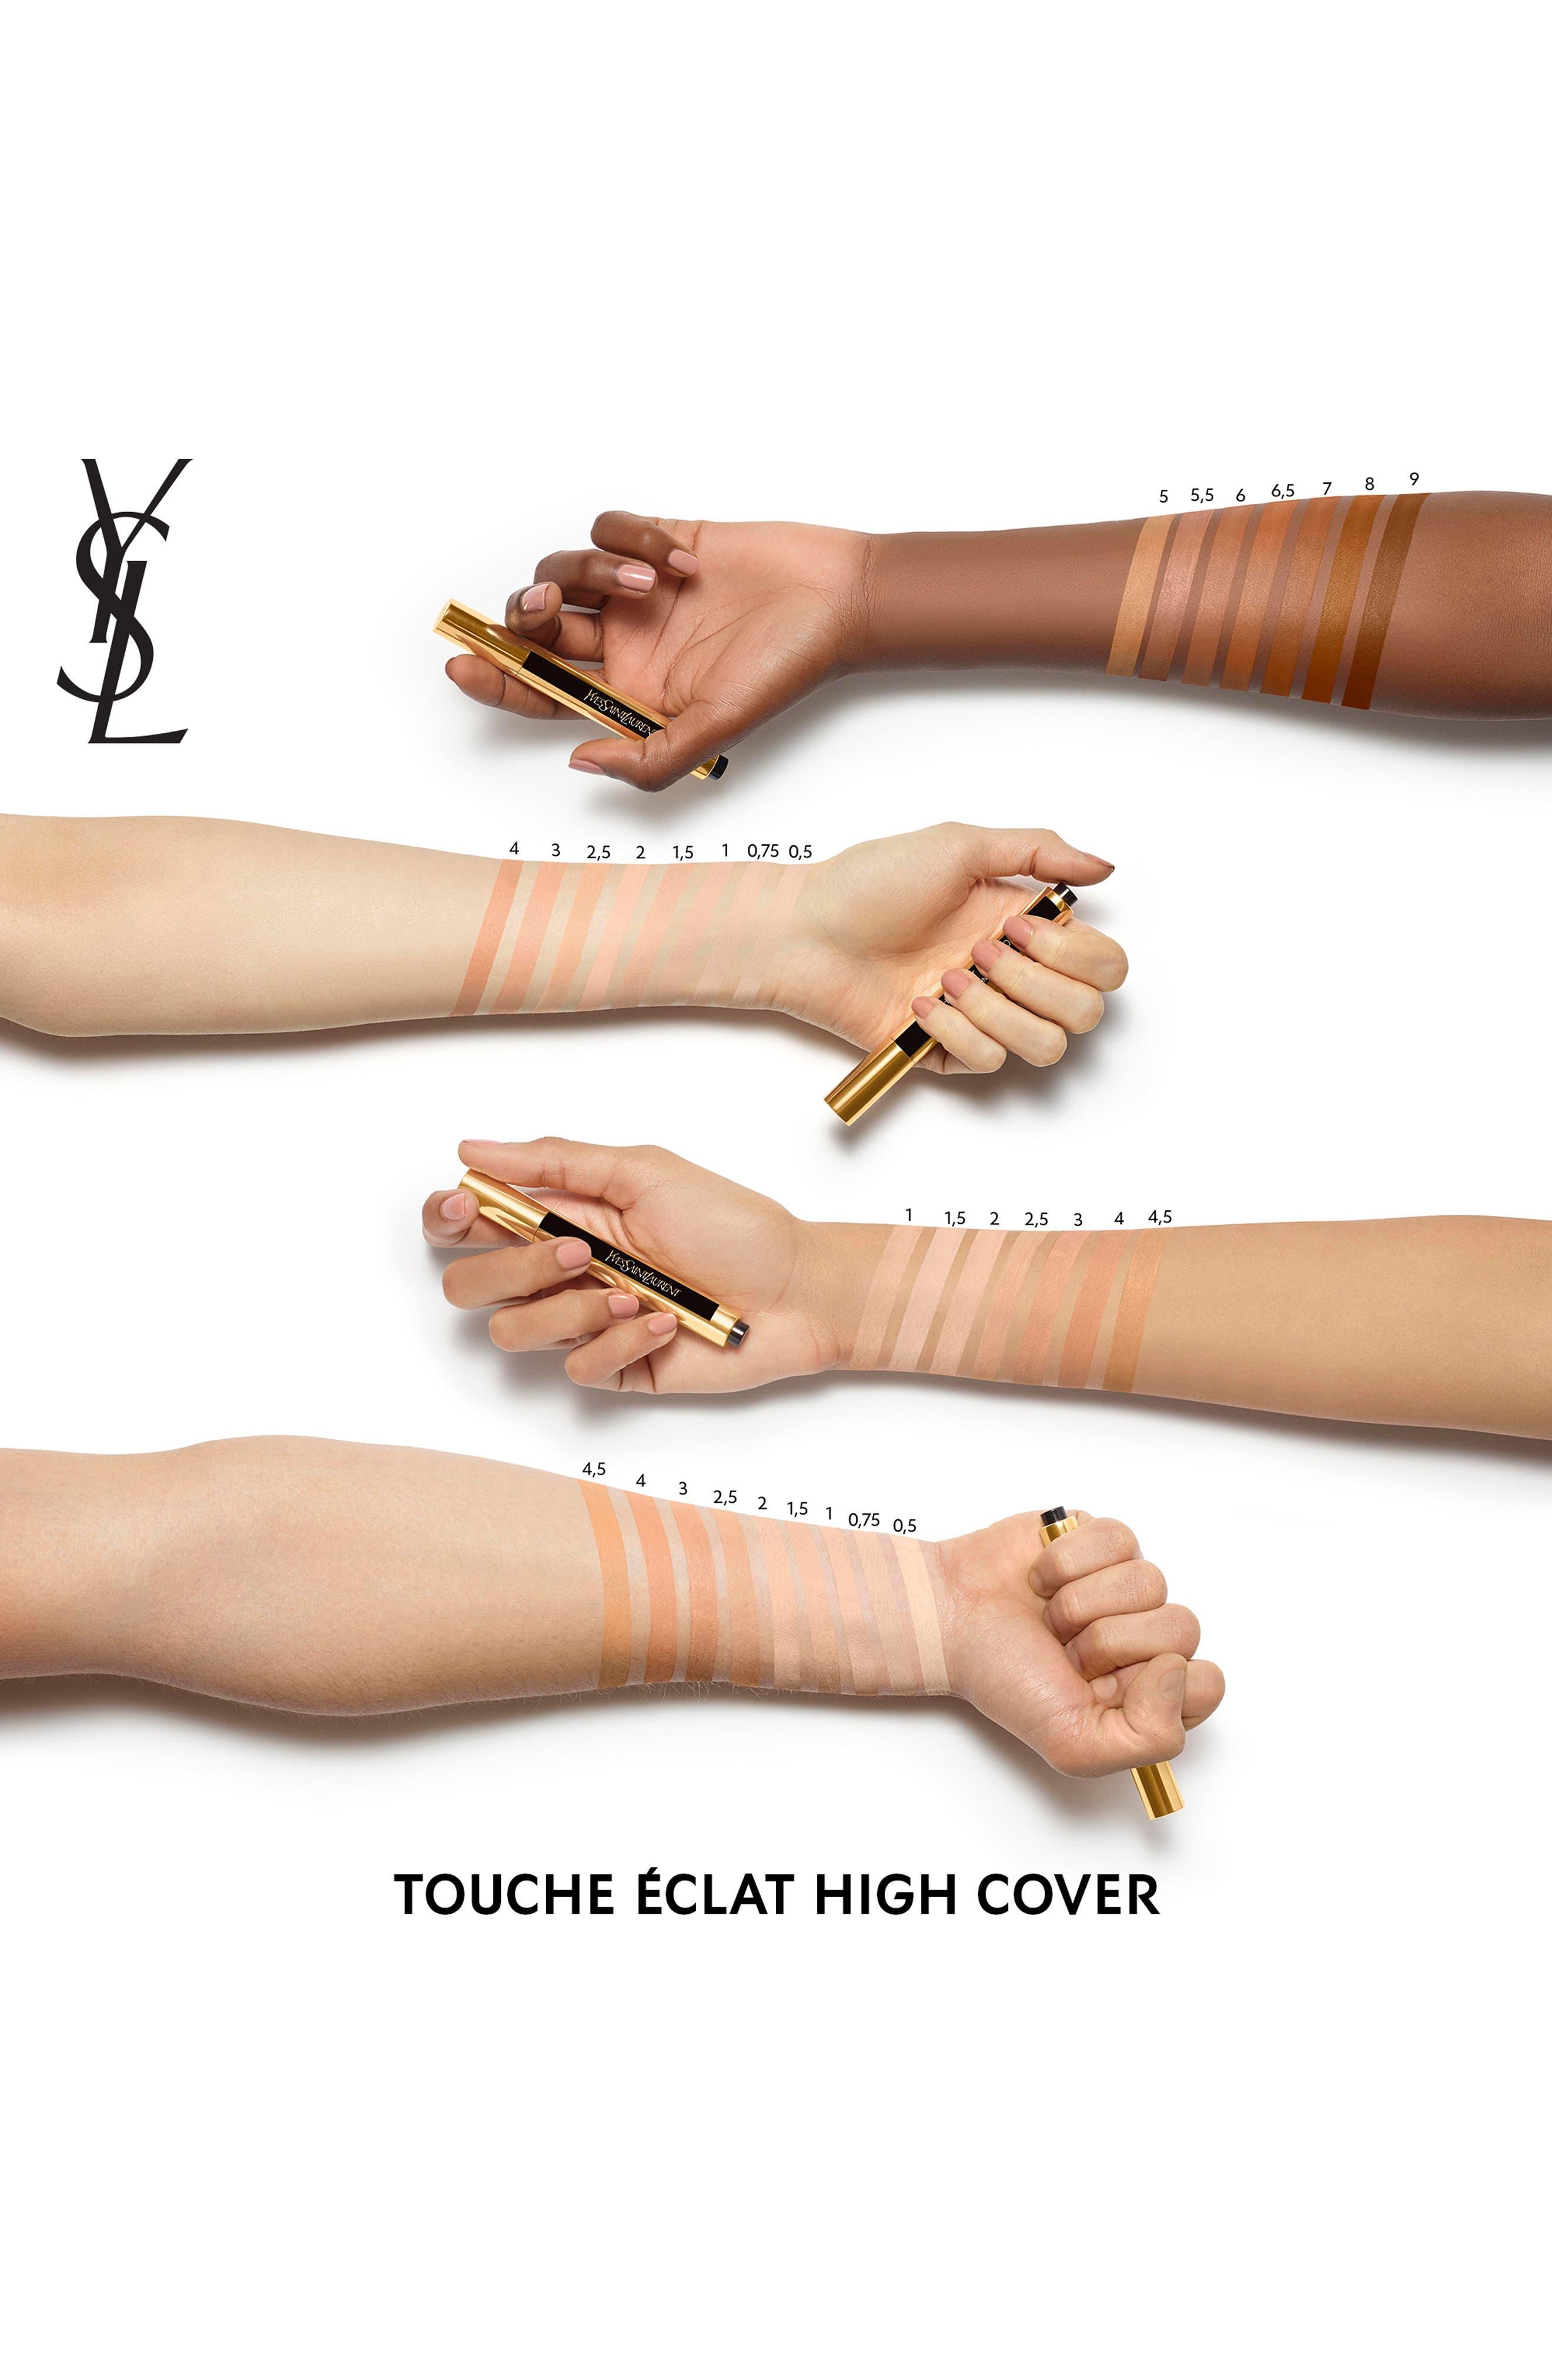 YVES SAINT LAURENT, Touche Eclat High Cover Radiant Concealer, Alternate thumbnail 3, color, 0.5 VANILLA